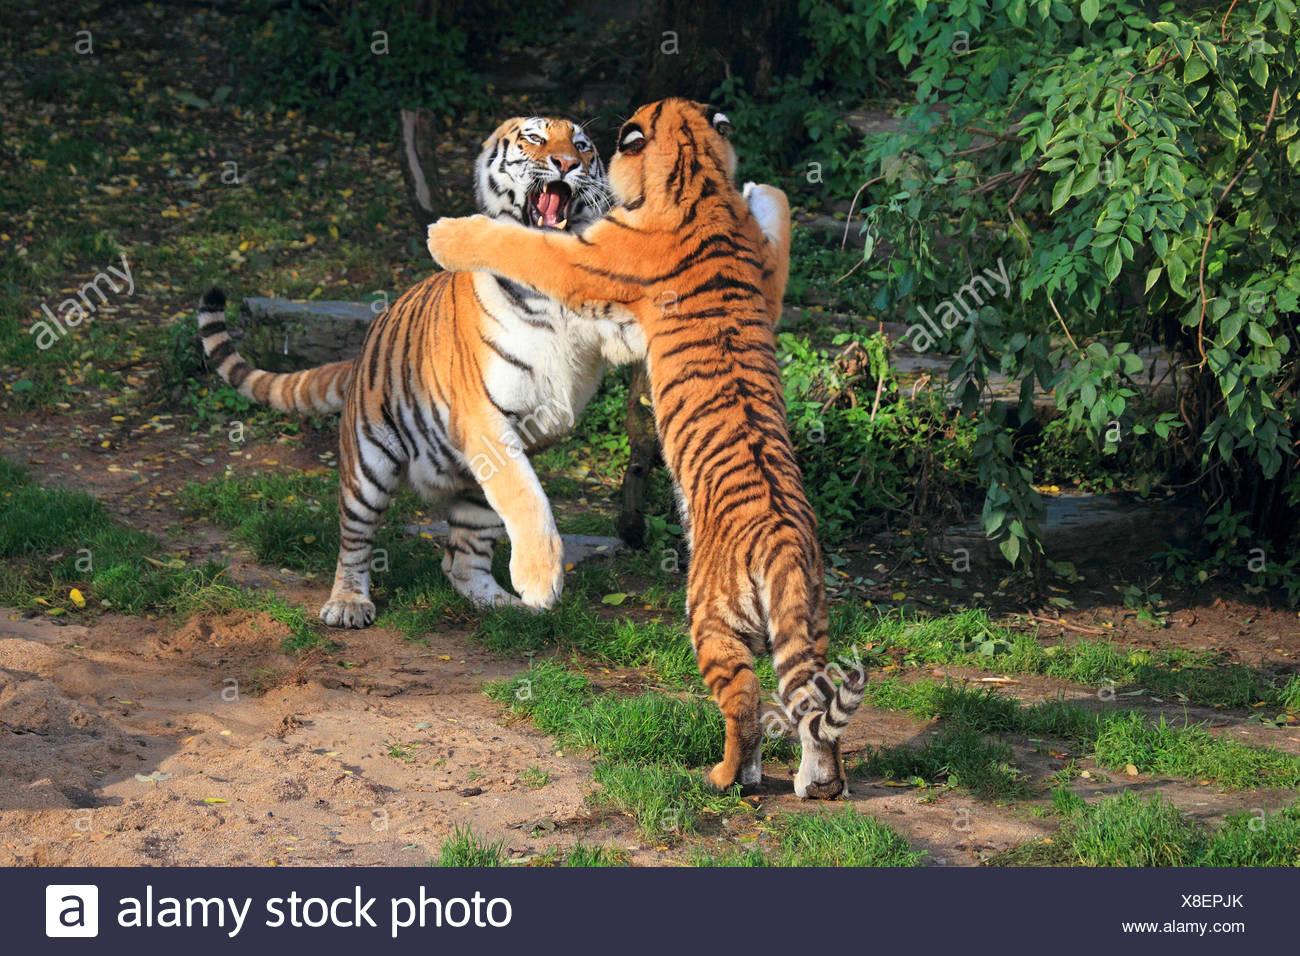 Siberian tiger, Amurian tiger (Panthera tigris altaica), two tussling tigers - Stock Image